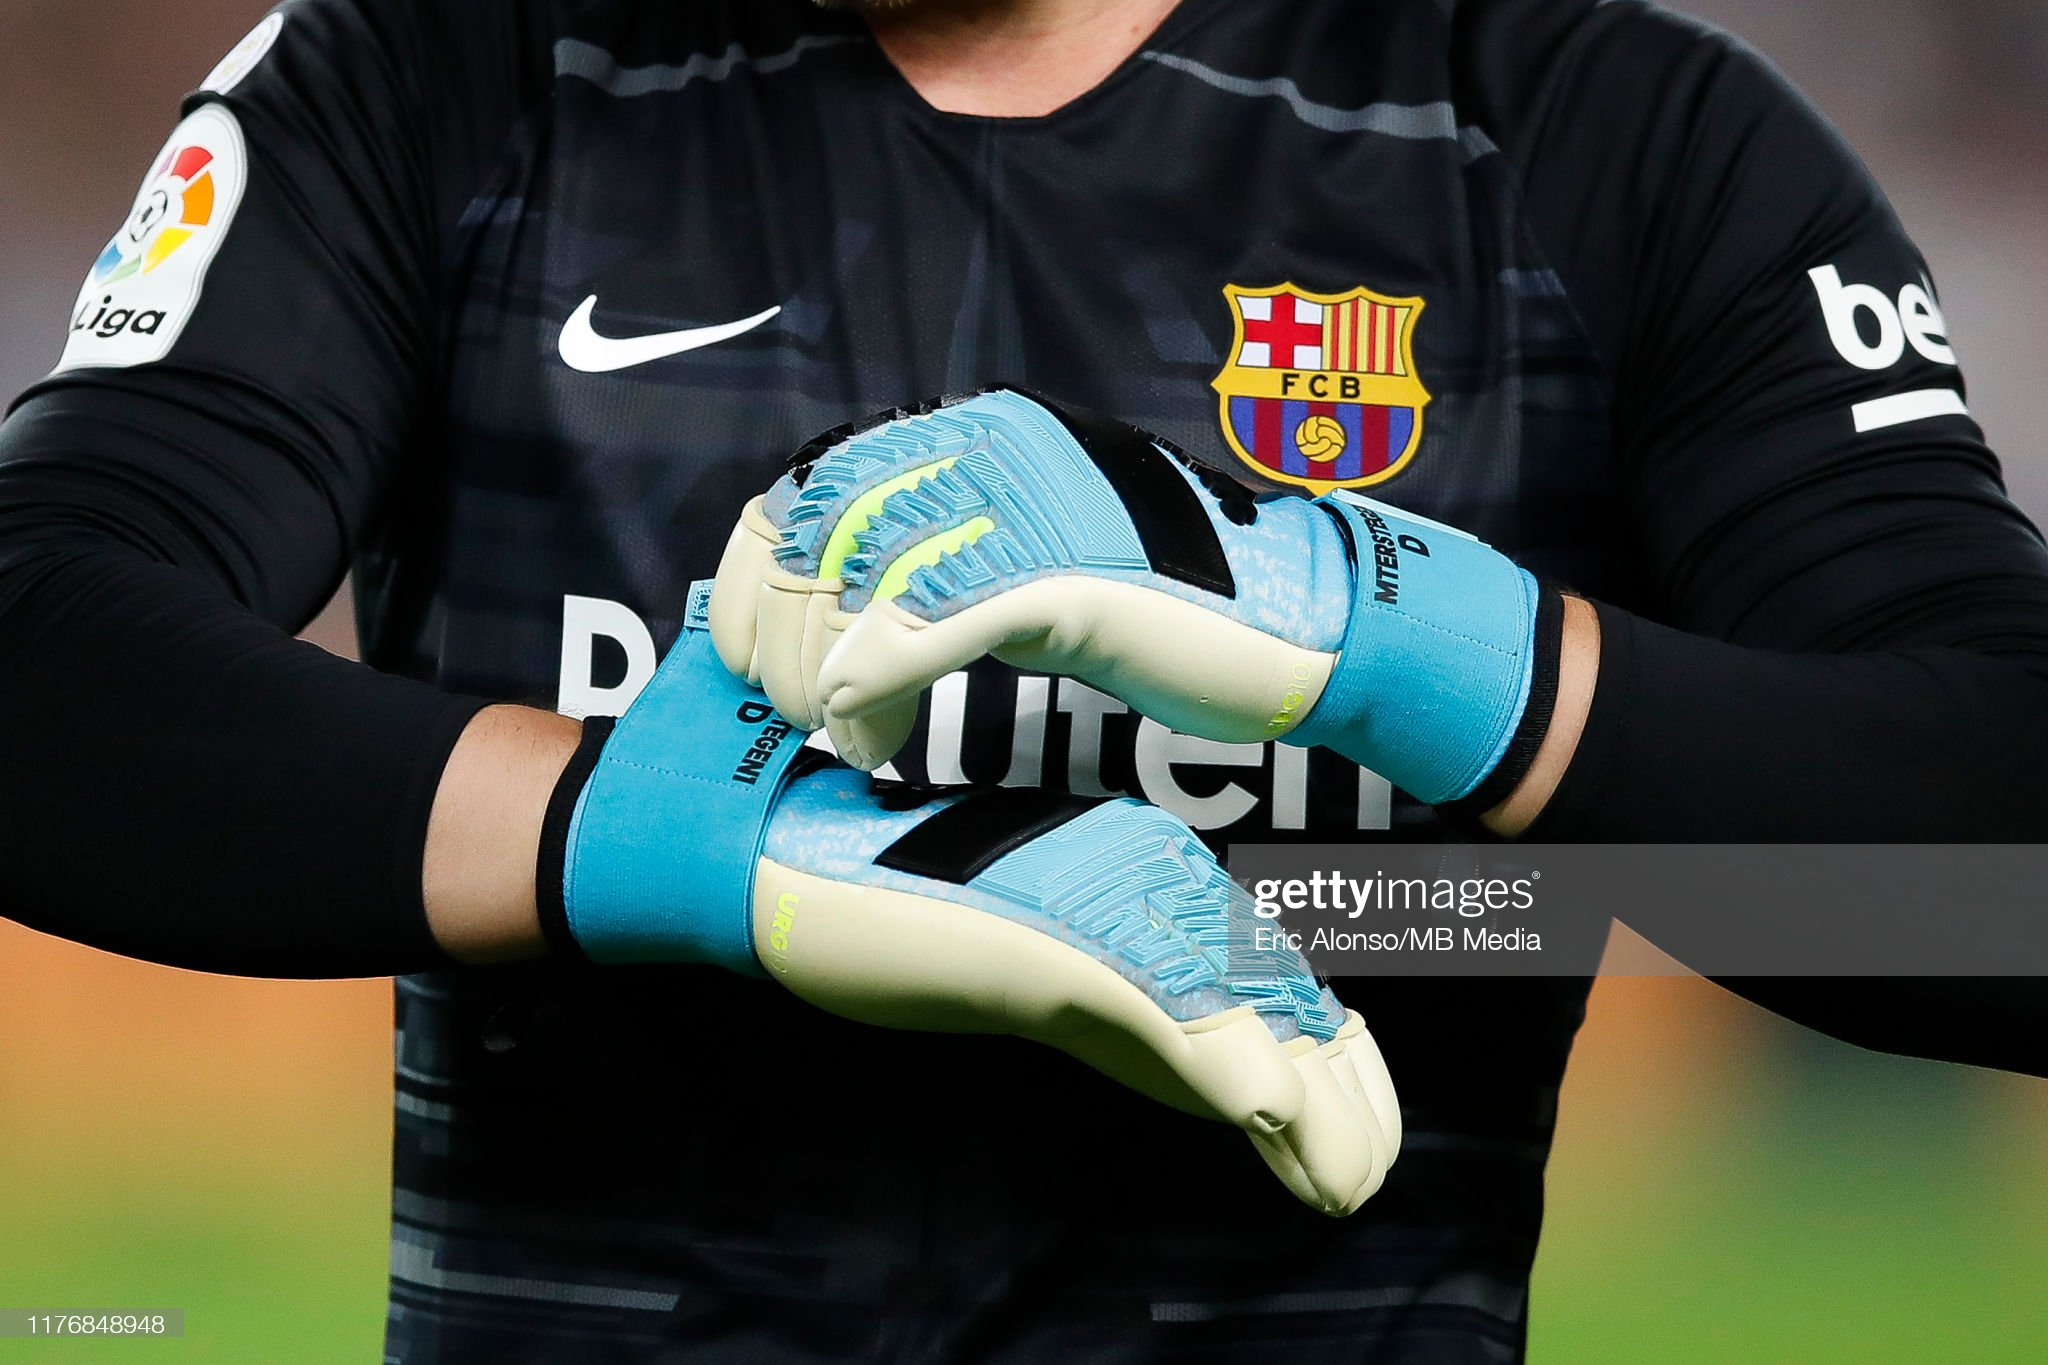 صور مباراة : برشلونة - فياريال 2-1 ( 24-09-2019 )  Marc-andre-ter-stegen-of-fc-barcelona-during-the-liga-match-between-picture-id1176848948?s=2048x2048